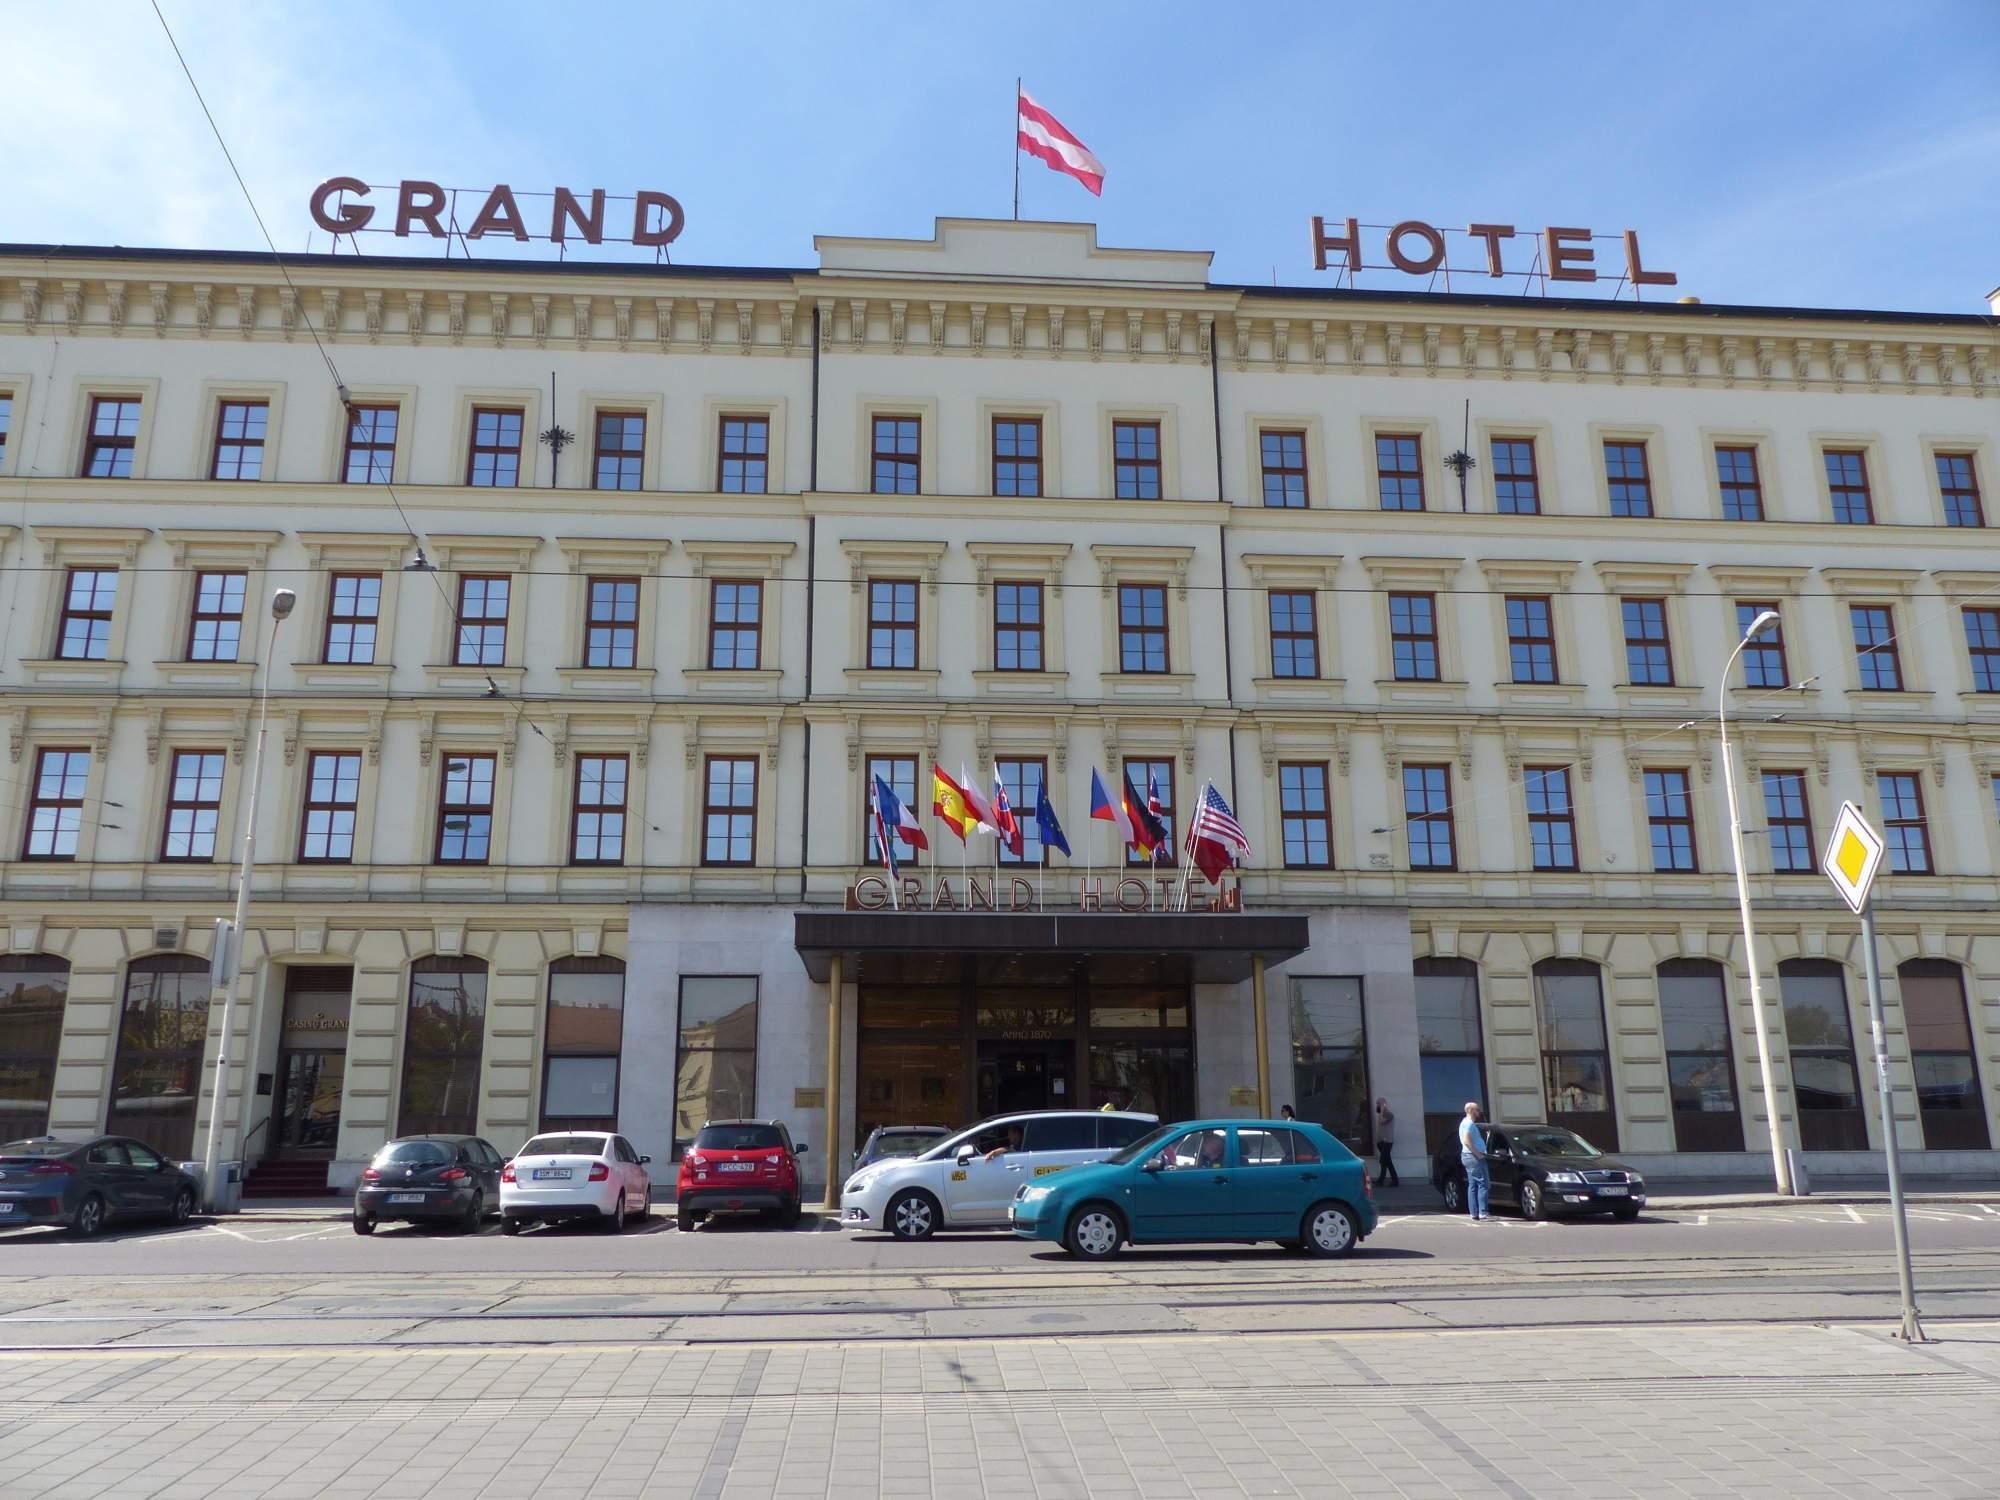 Grandhotel Brno. Foto: Stanislav Šindelka